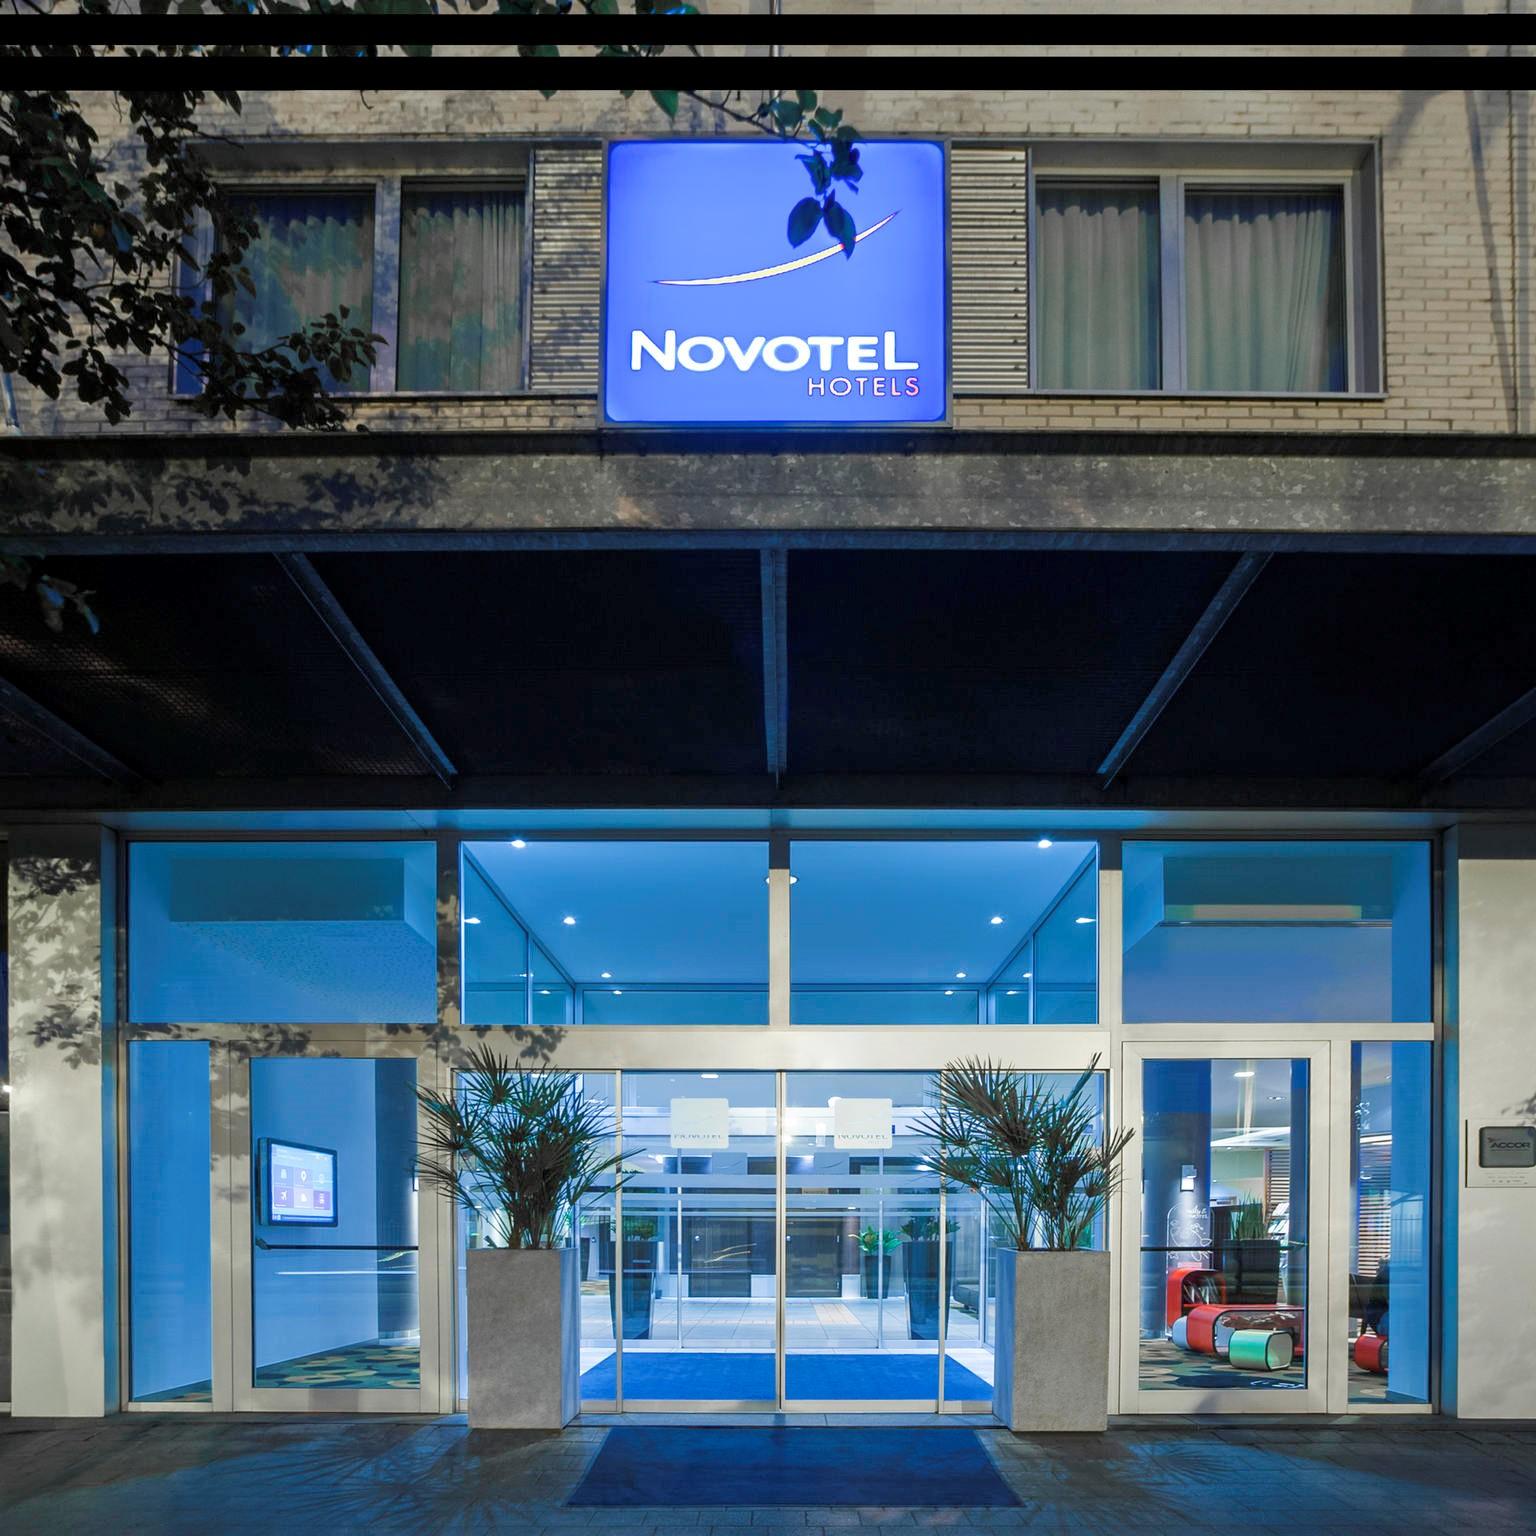 Novotel Leuven